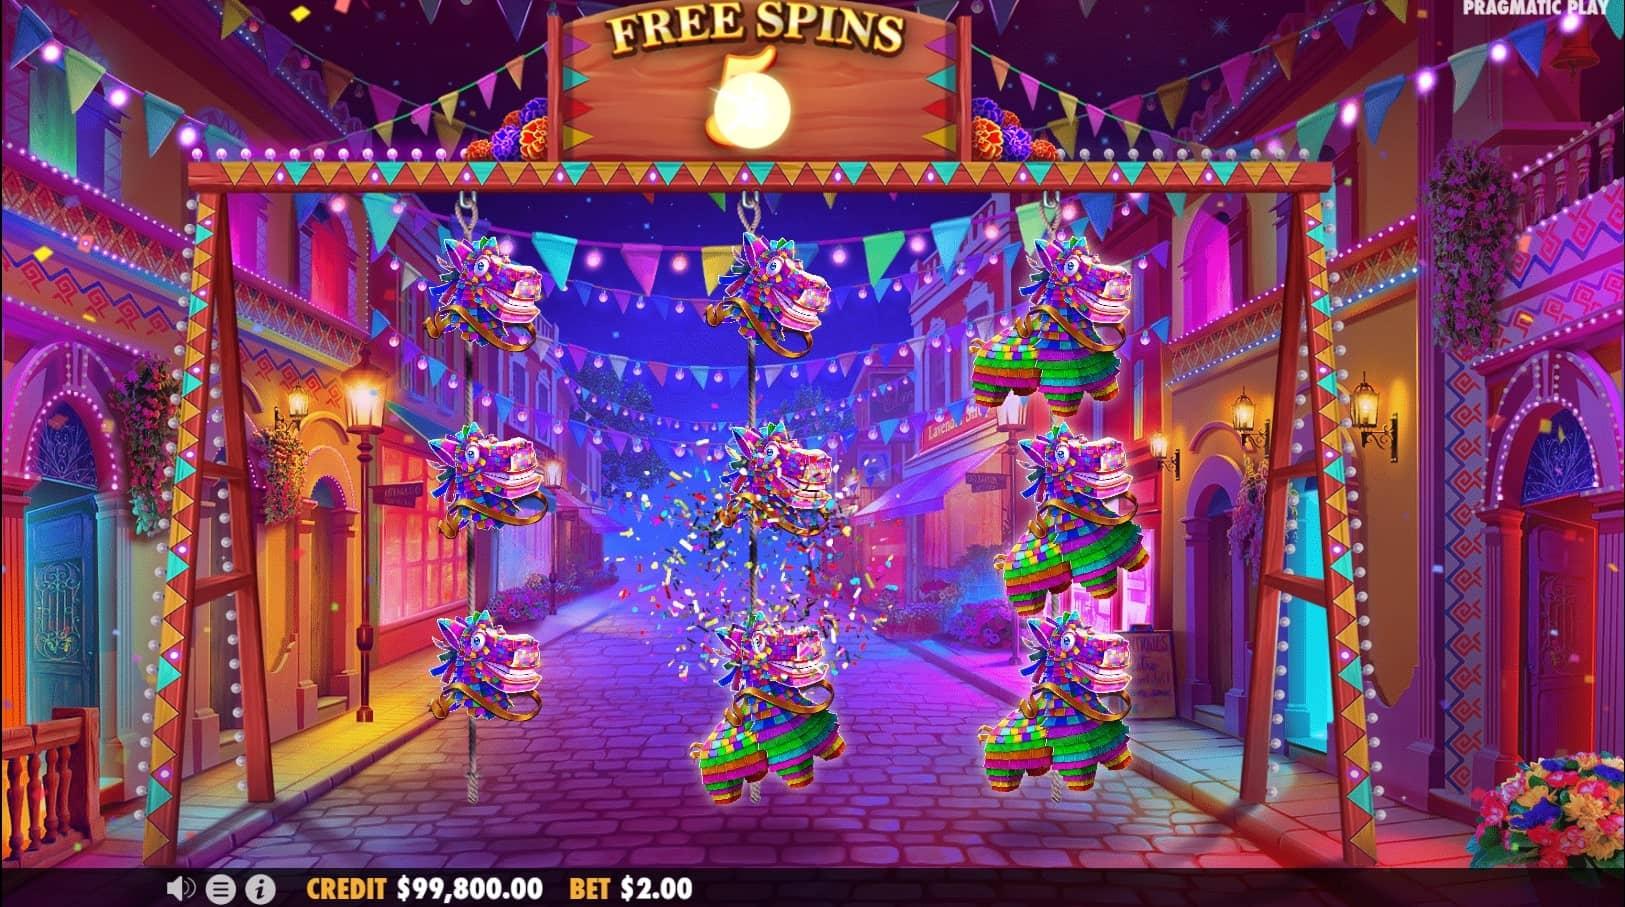 Hot Fiesta Slot Free Spins